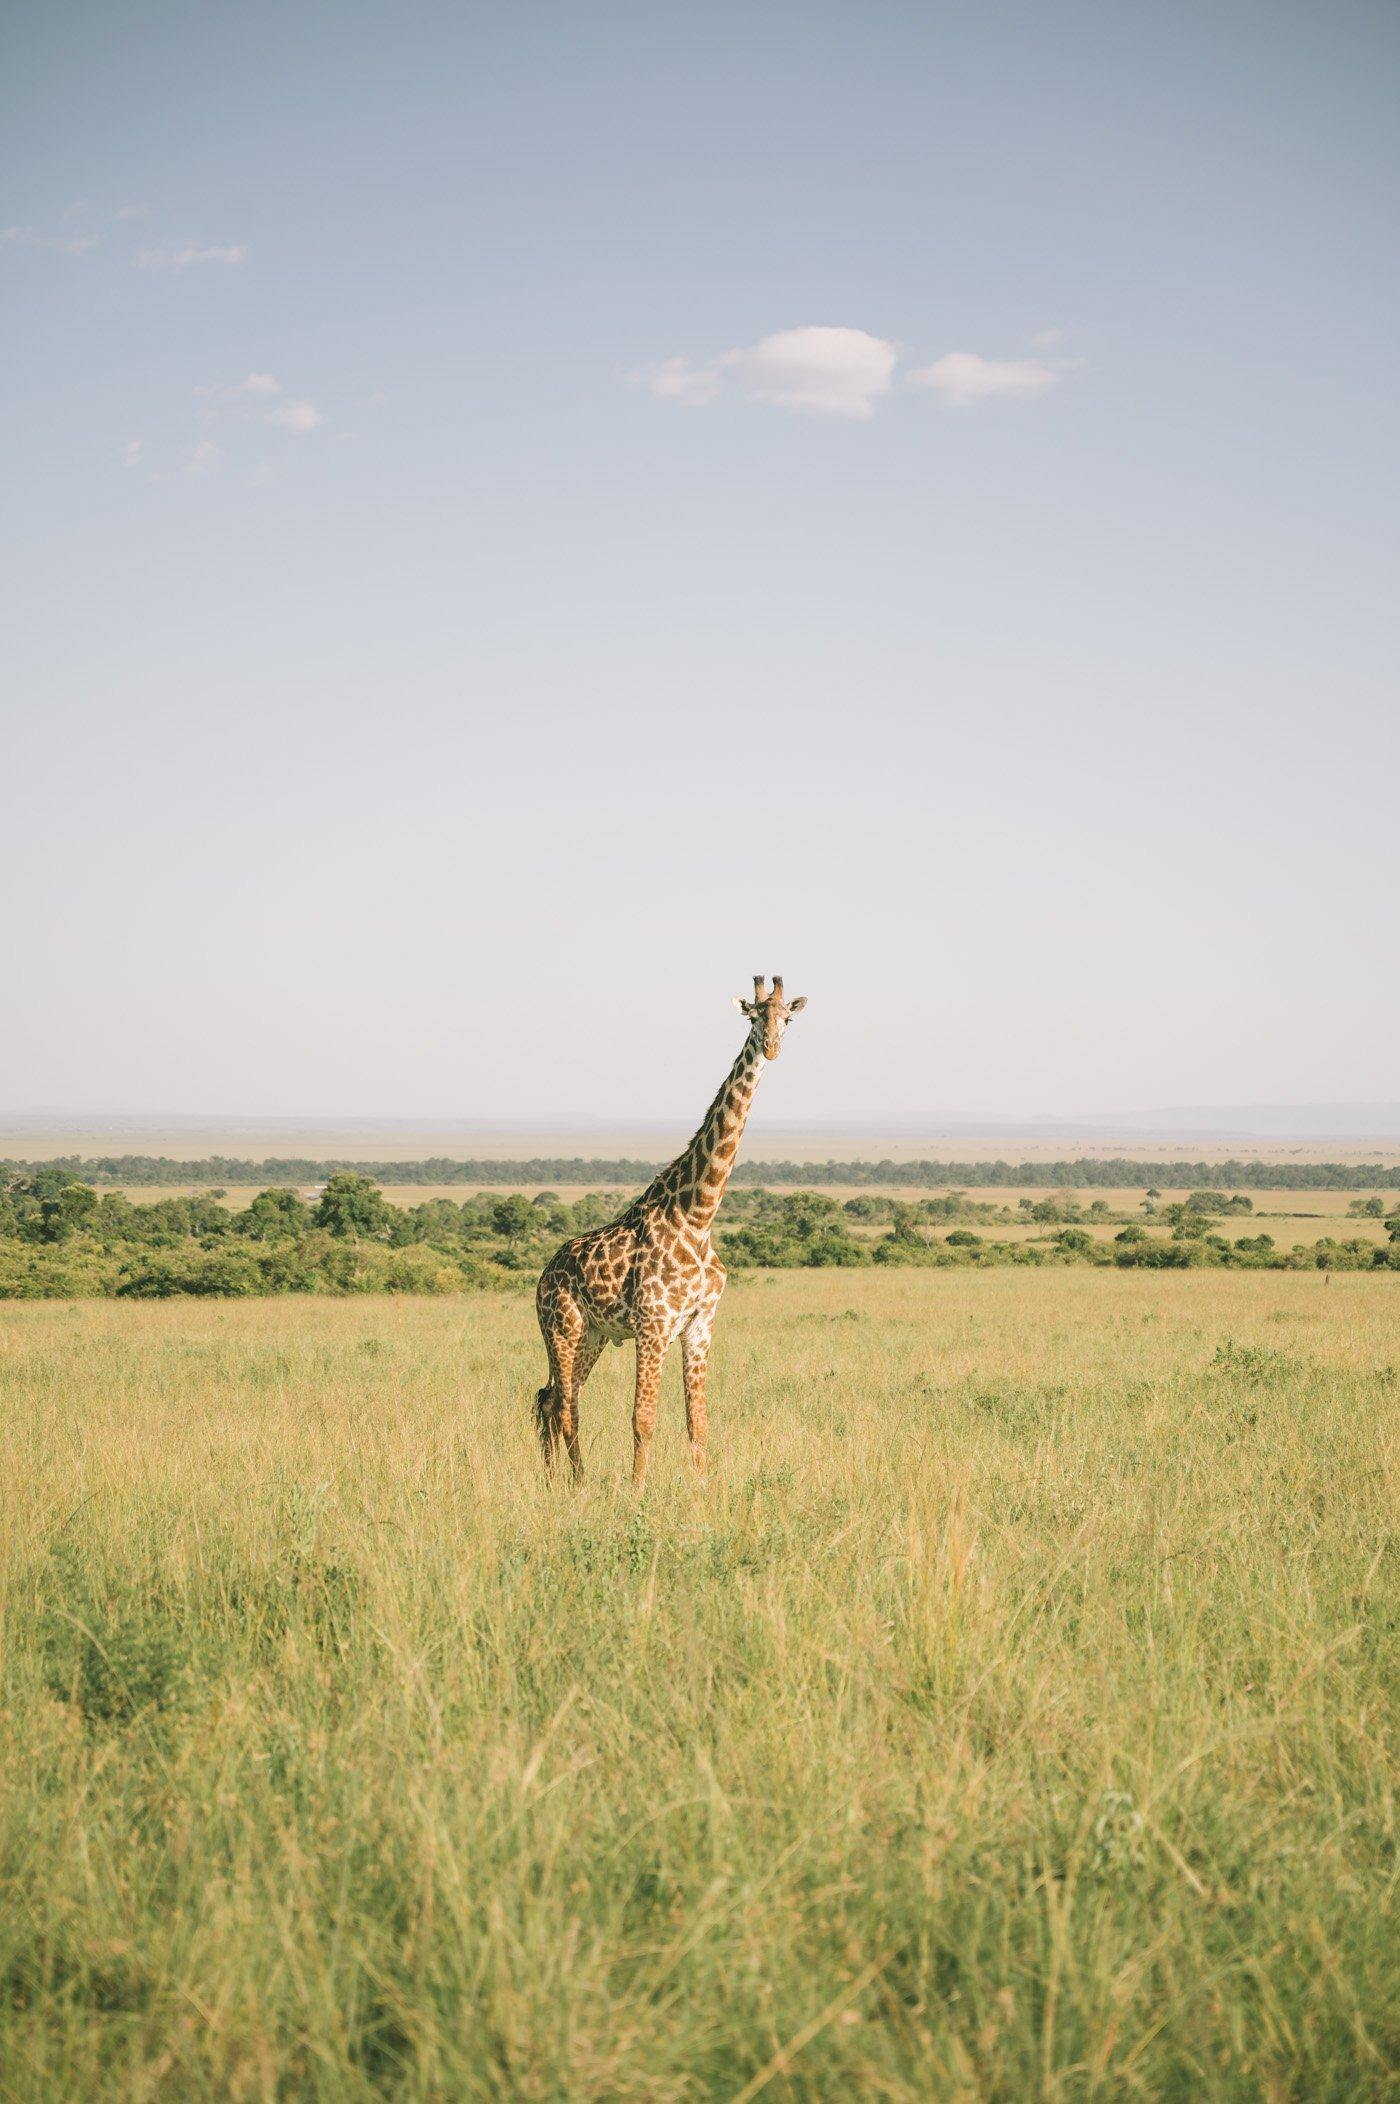 Giraffe in the Mara Triangle in Kenya